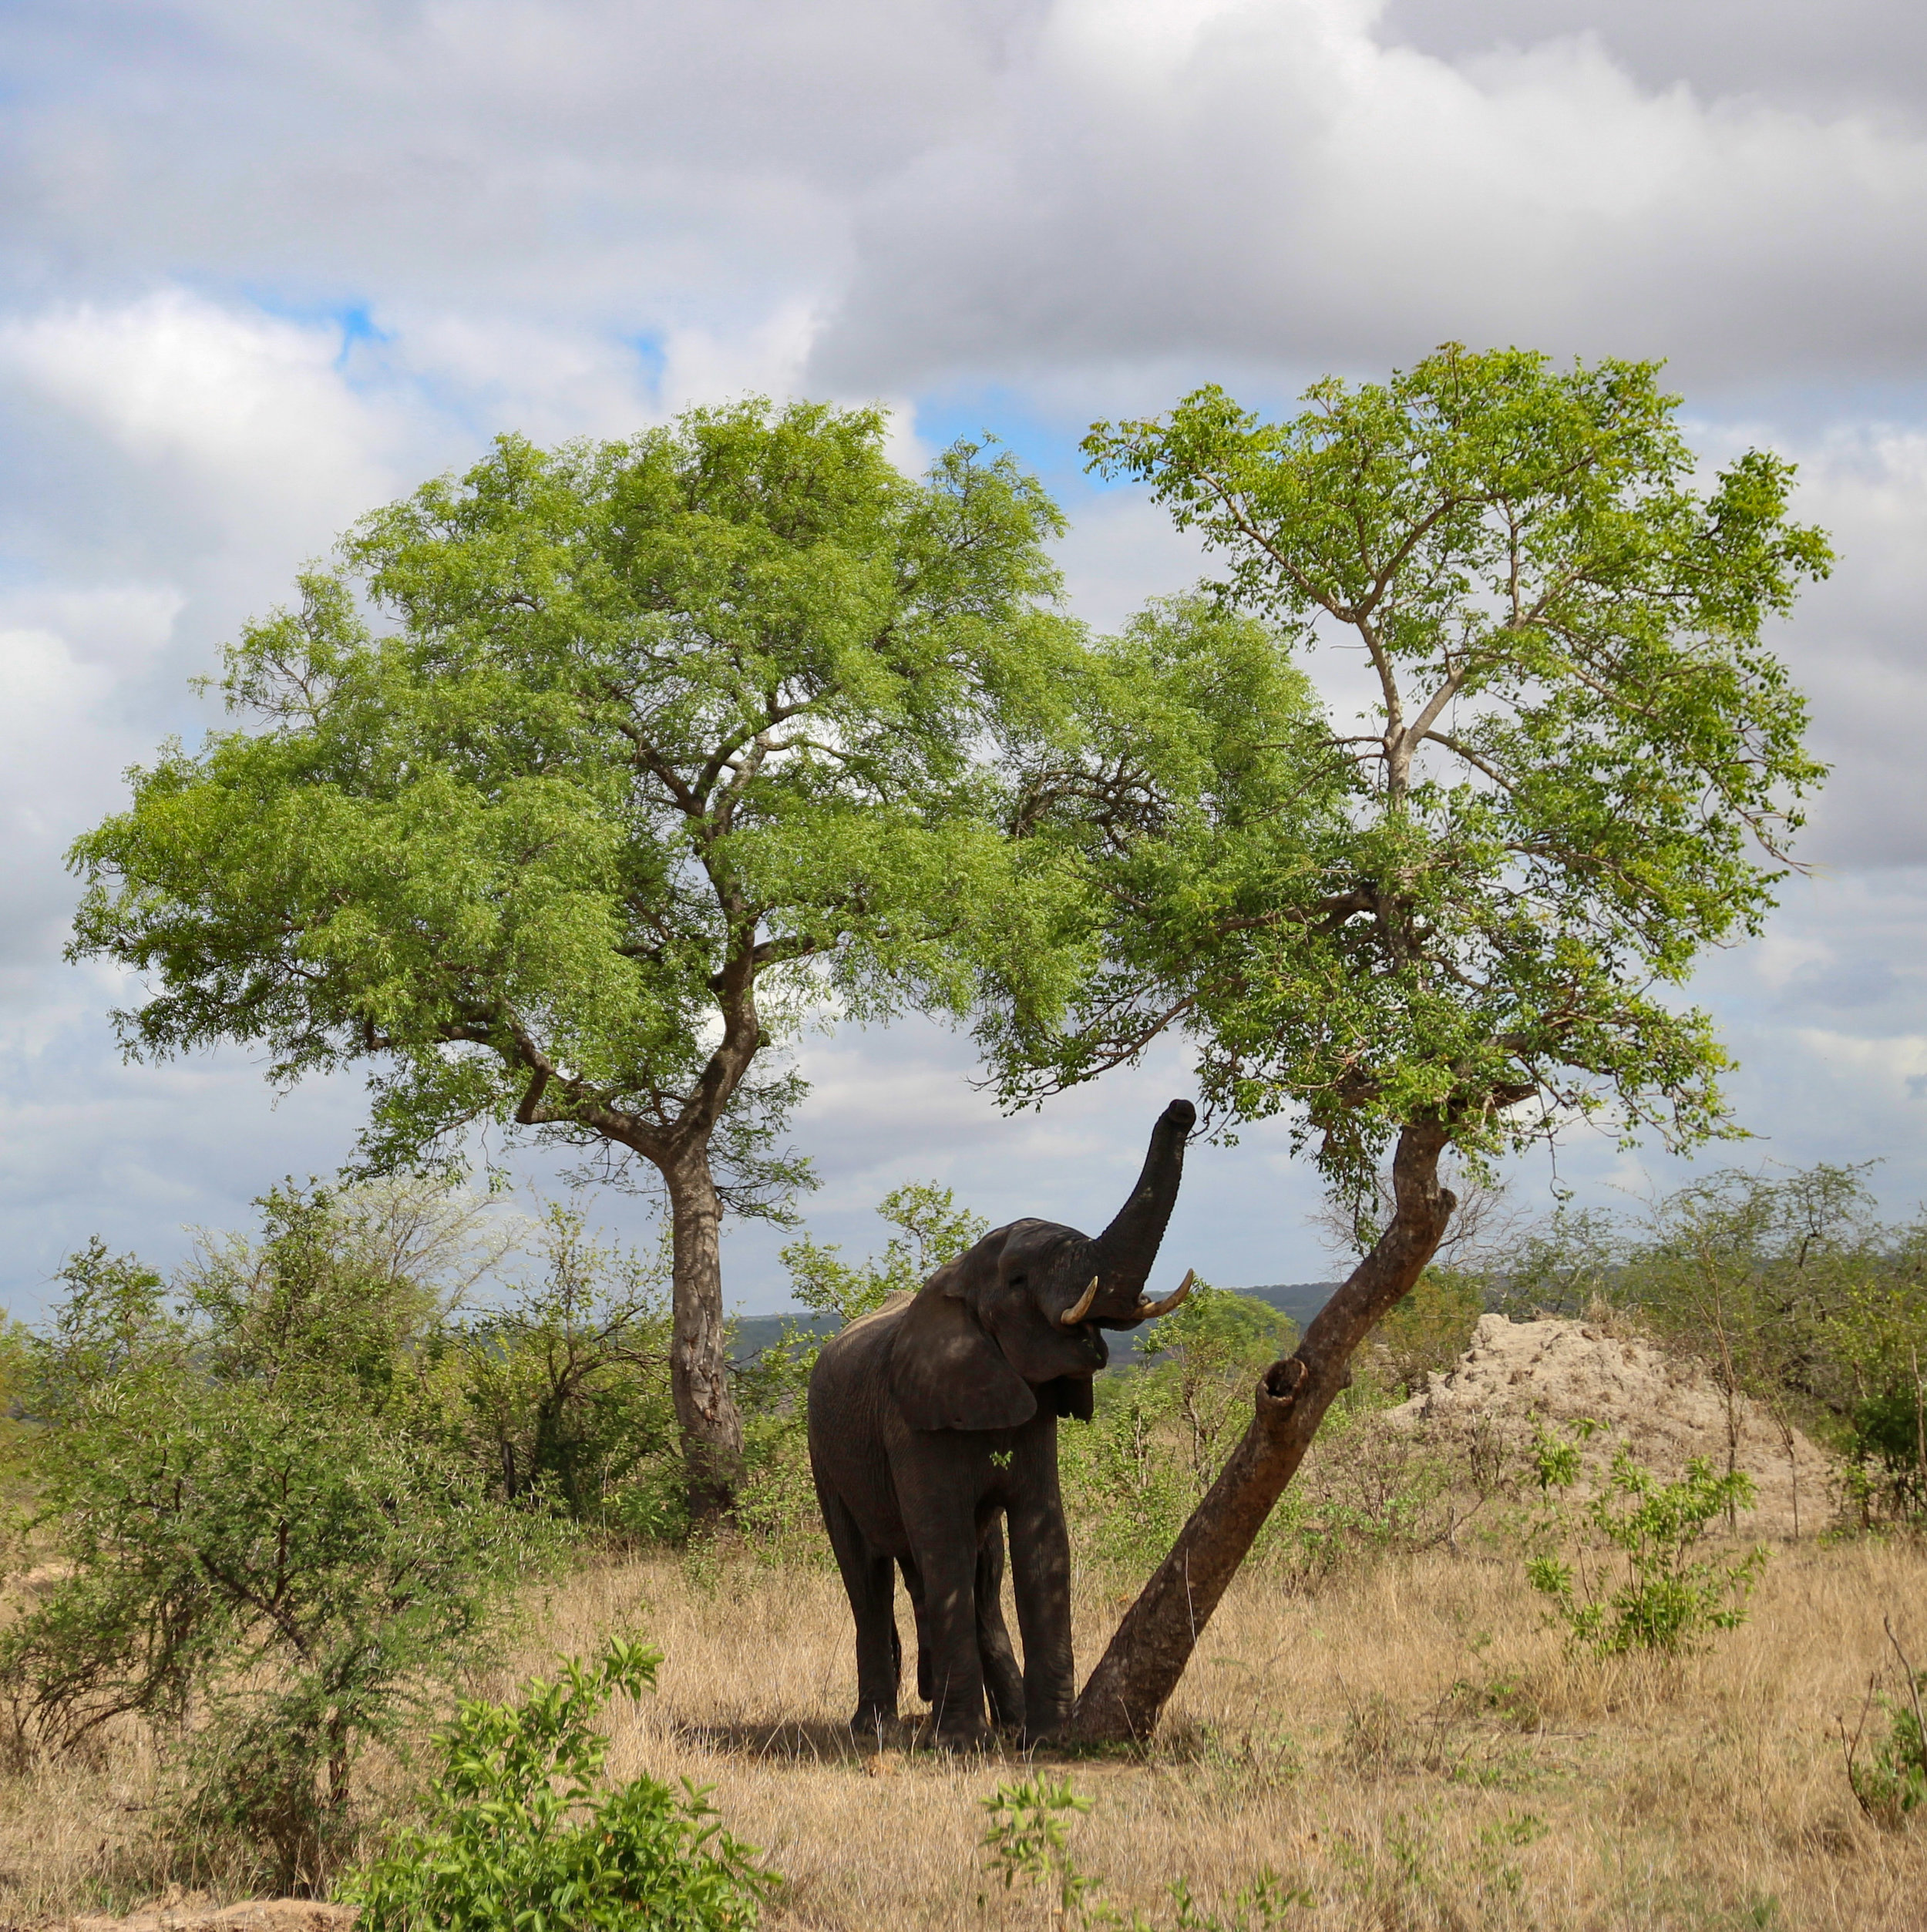 south africa elephant  (1 of 1).jpg